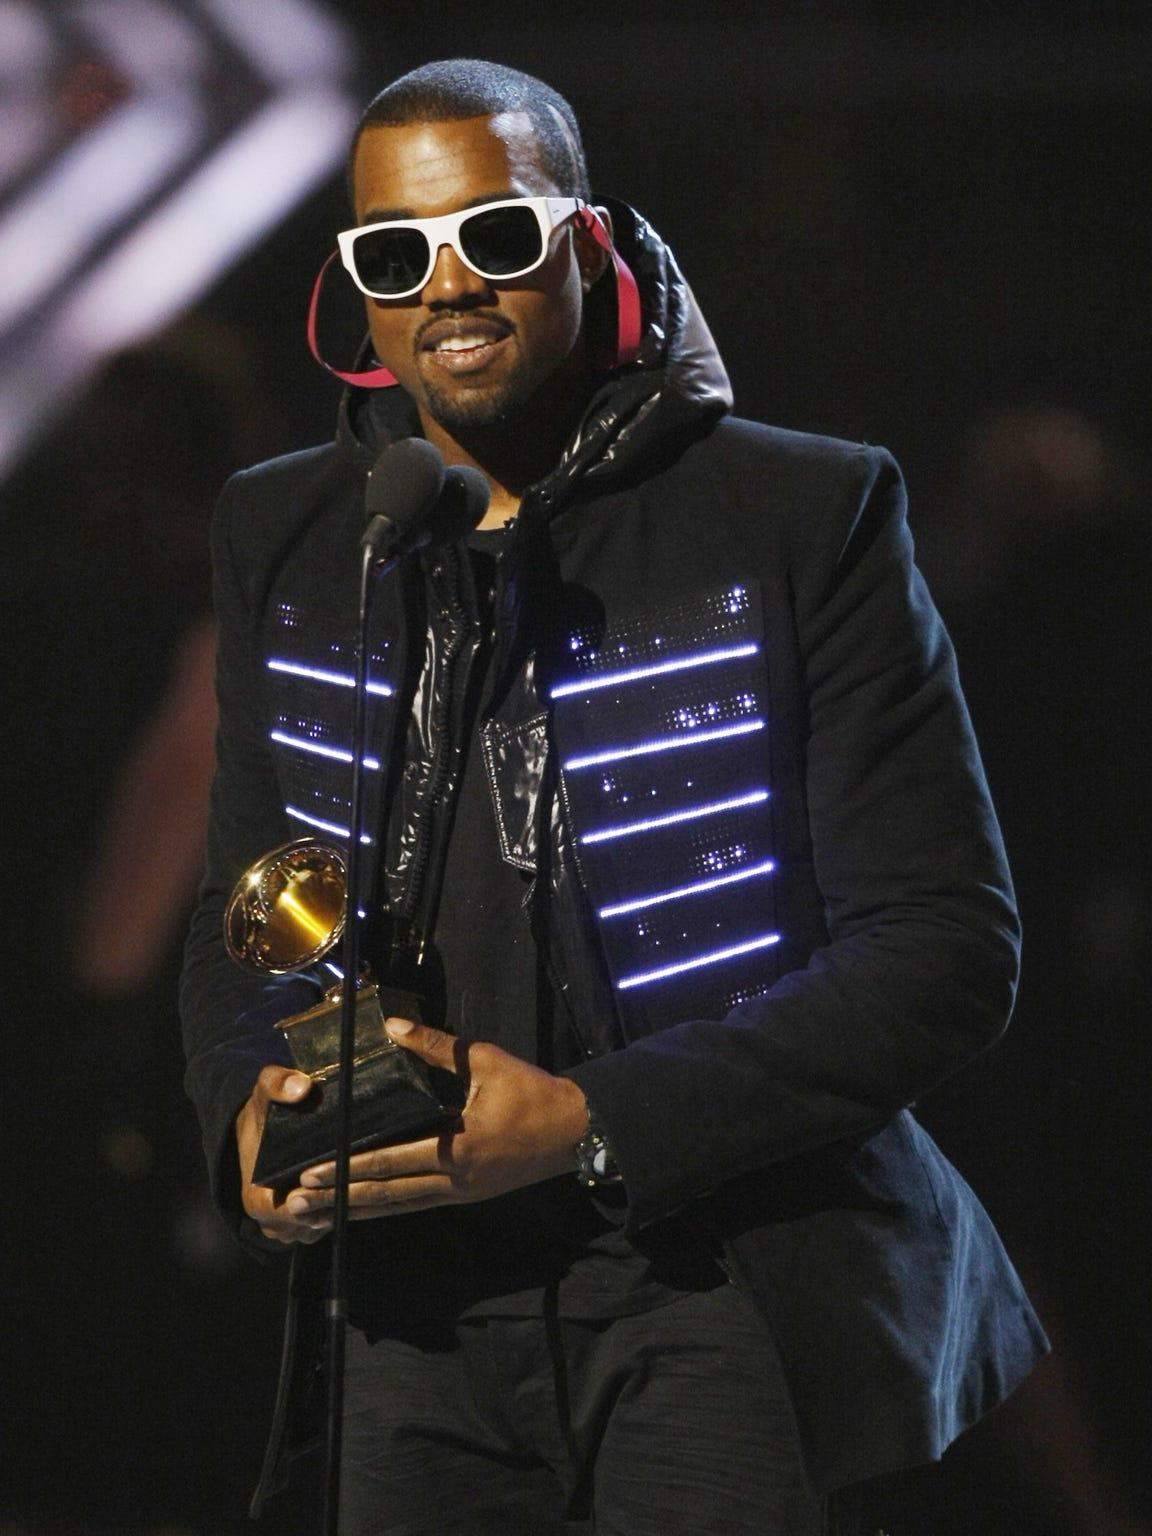 2008 winner for Best Rap Album Kanye West accepts the